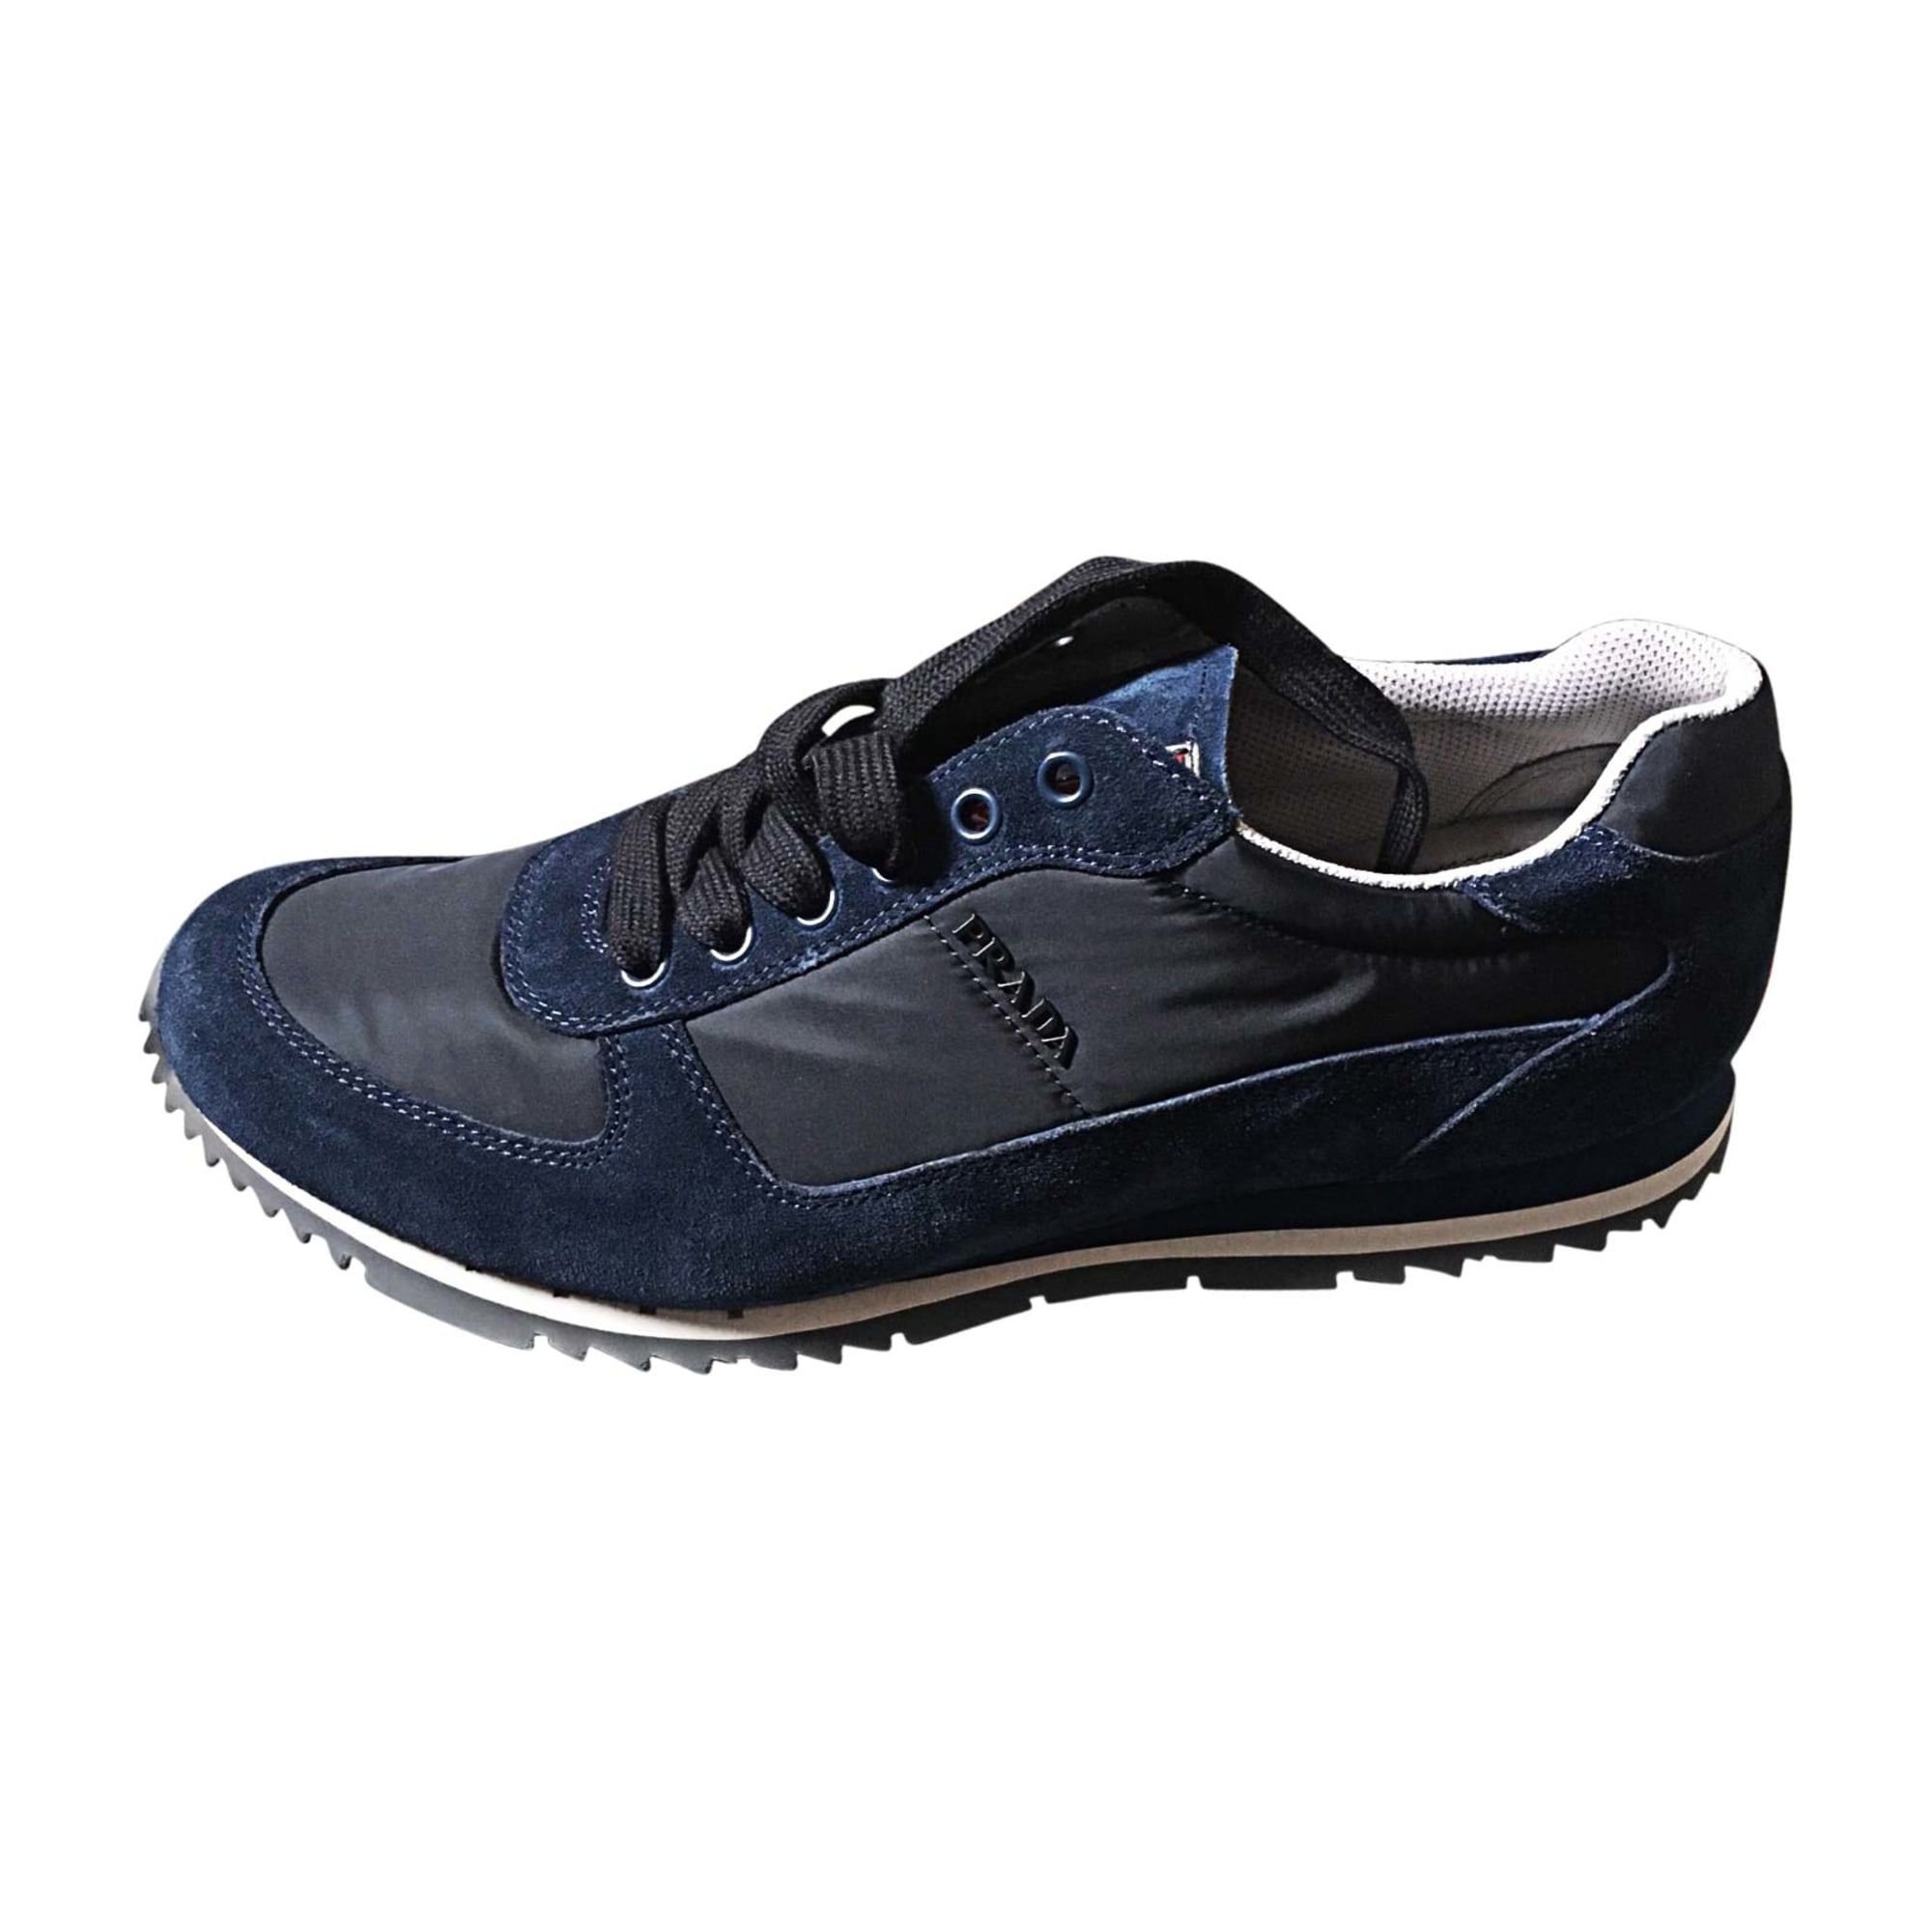 Sneakers PRADA Blue, navy, turquoise